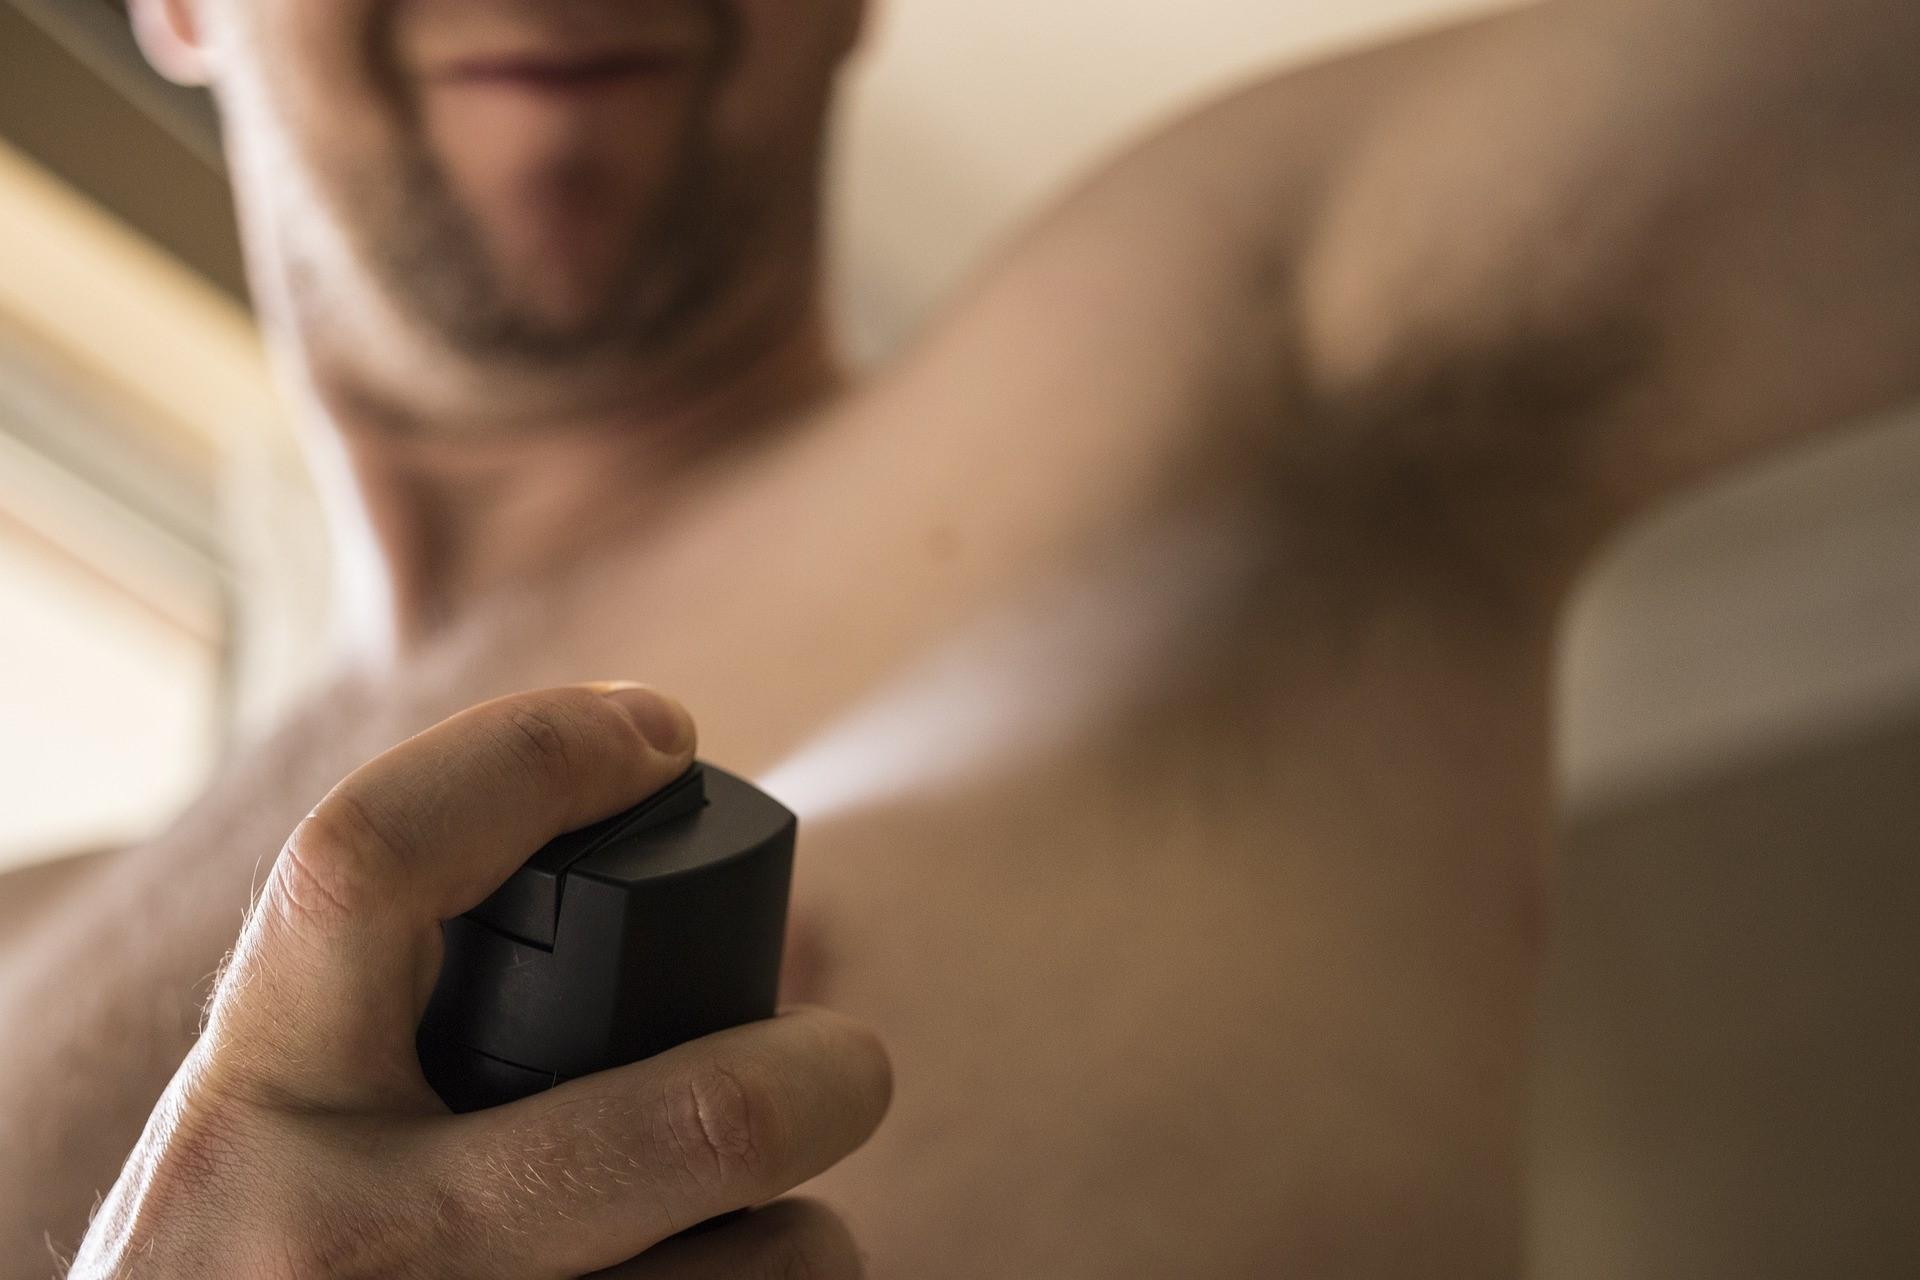 miglior-deodorante-uomo